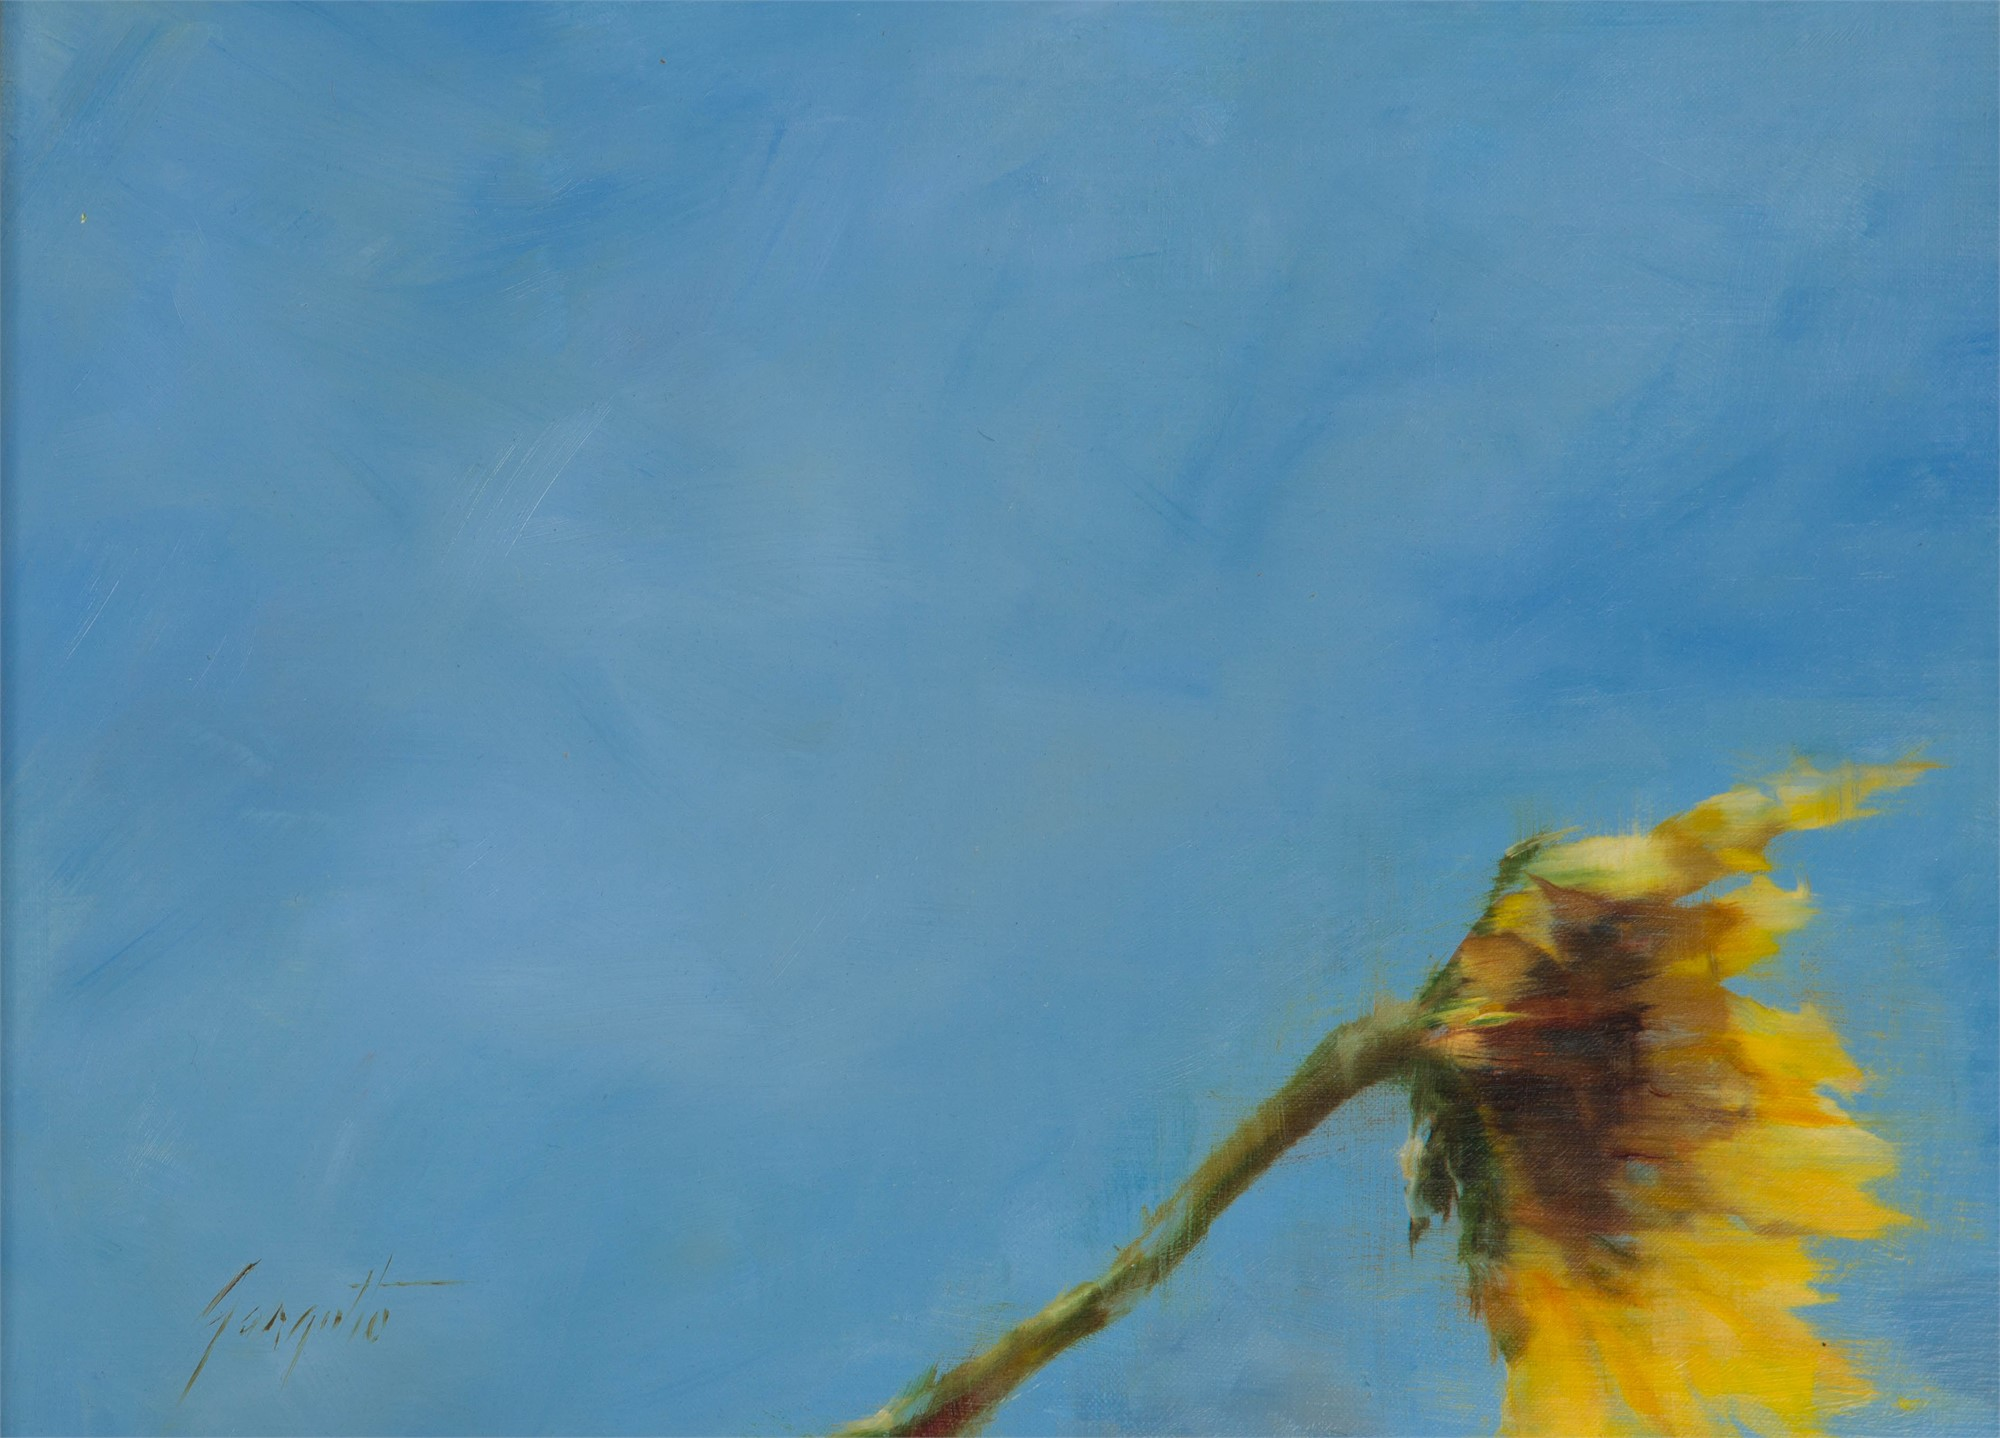 In the Breeze #1 by Ann Gargotto